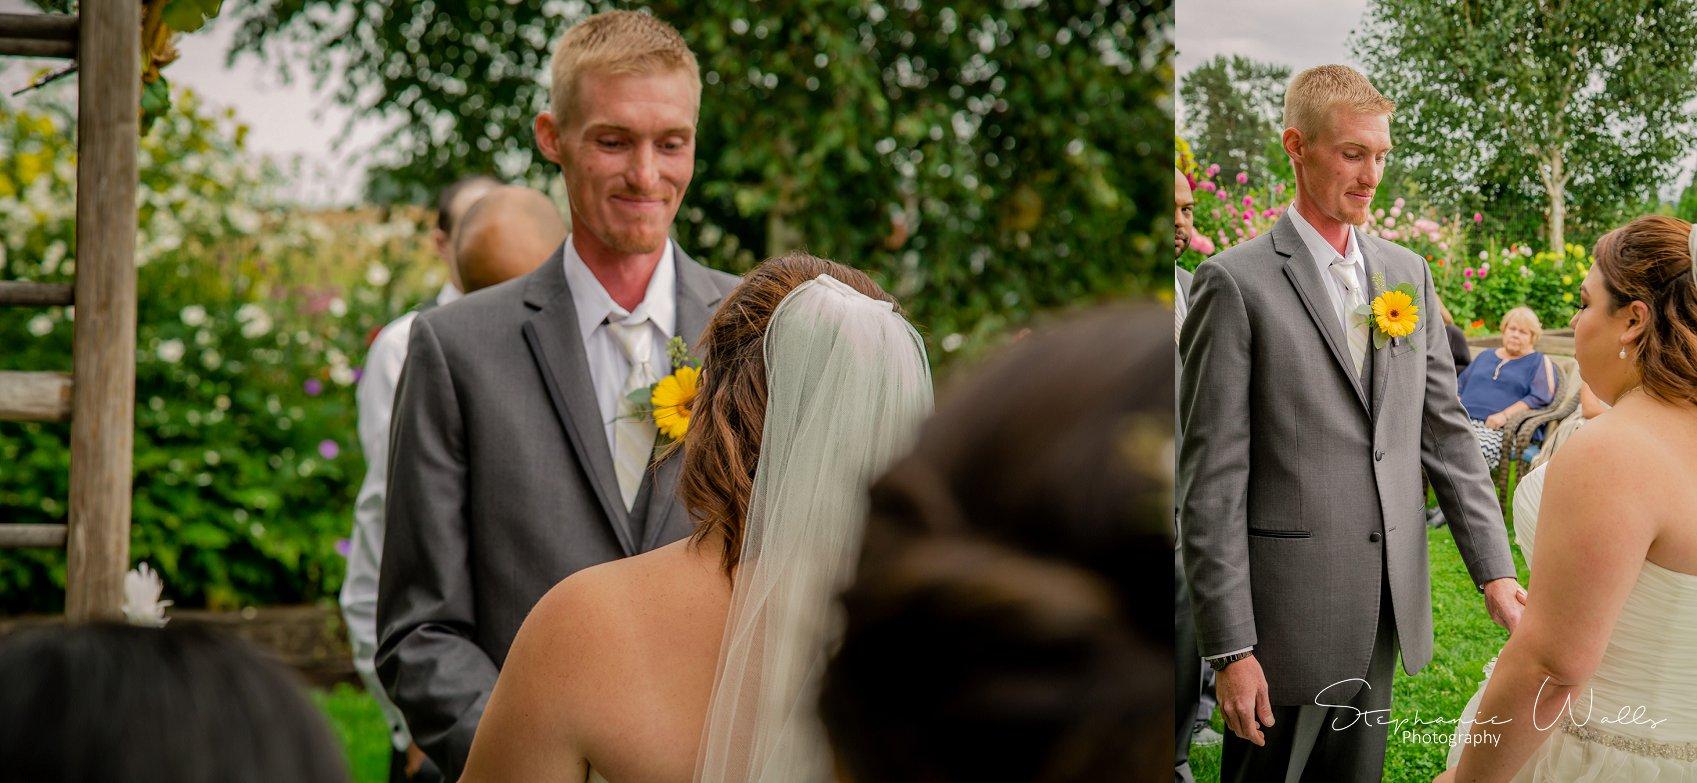 Kimble Wedding 194 Marlena & Allans | Snohomish Red Barn Events (Stocker Farms) | Snohomish, Wa Wedding Photographer